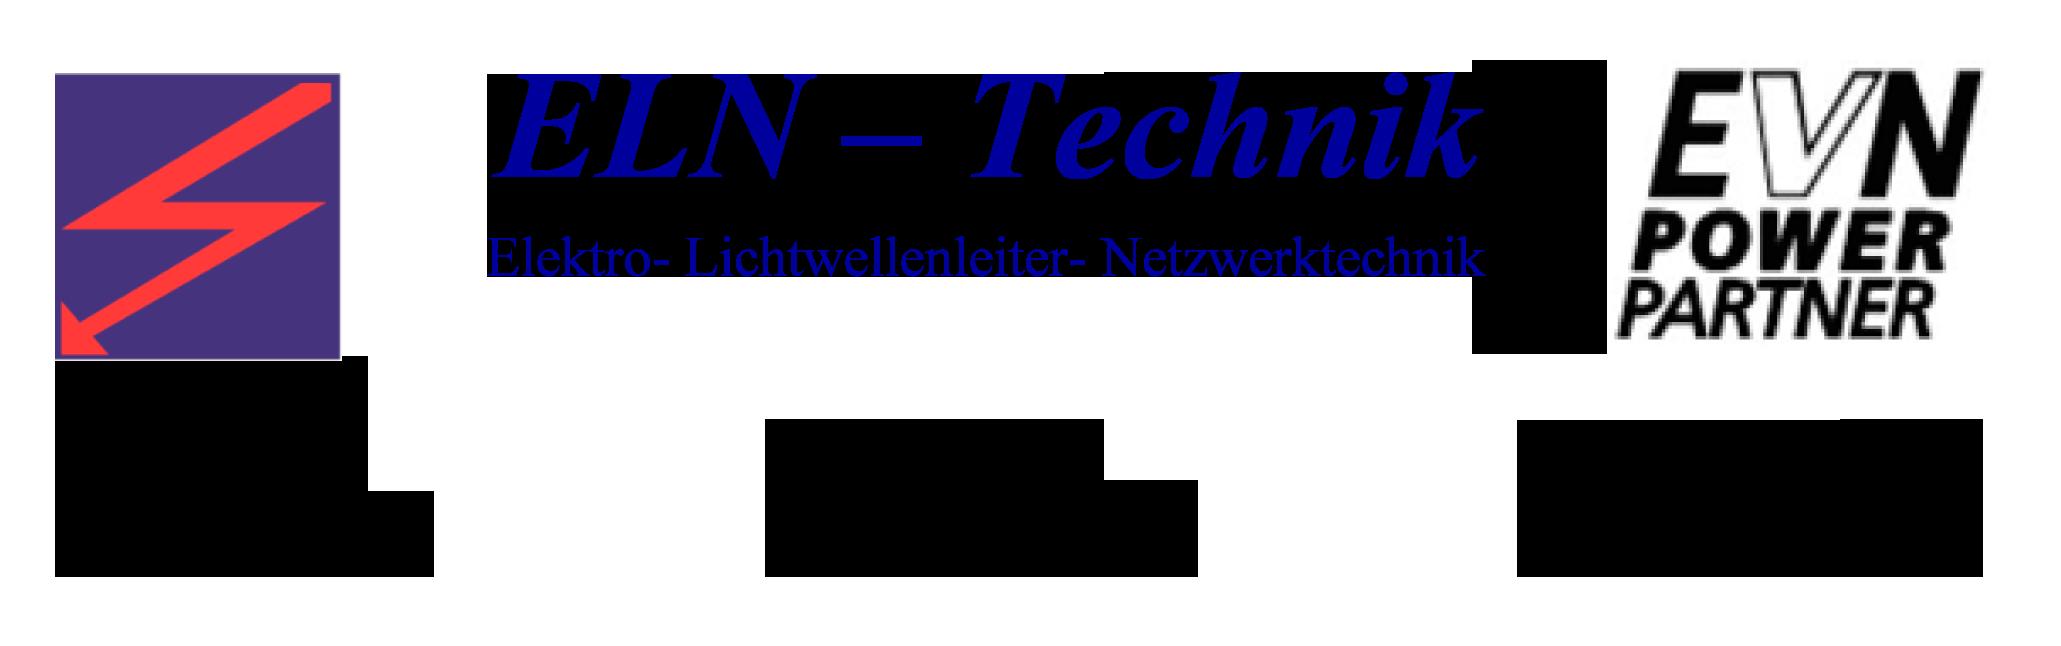 ELN Technik